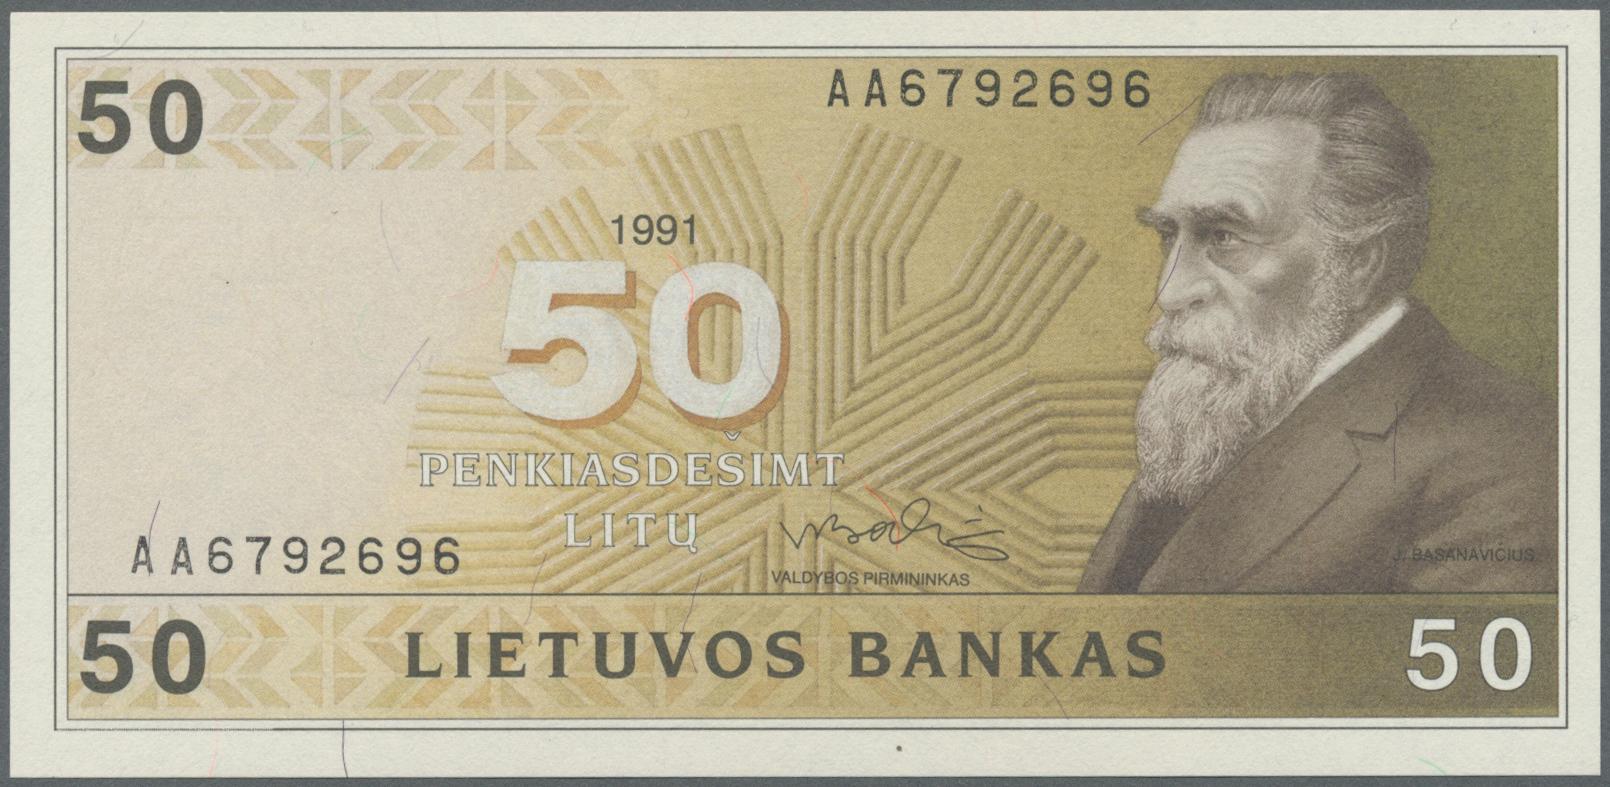 Lot 1212 - Lithuania / Litauen | Banknoten  -  Auktionshaus Christoph Gärtner GmbH & Co. KG Banknotes Worldwide Auction #39 Day 1